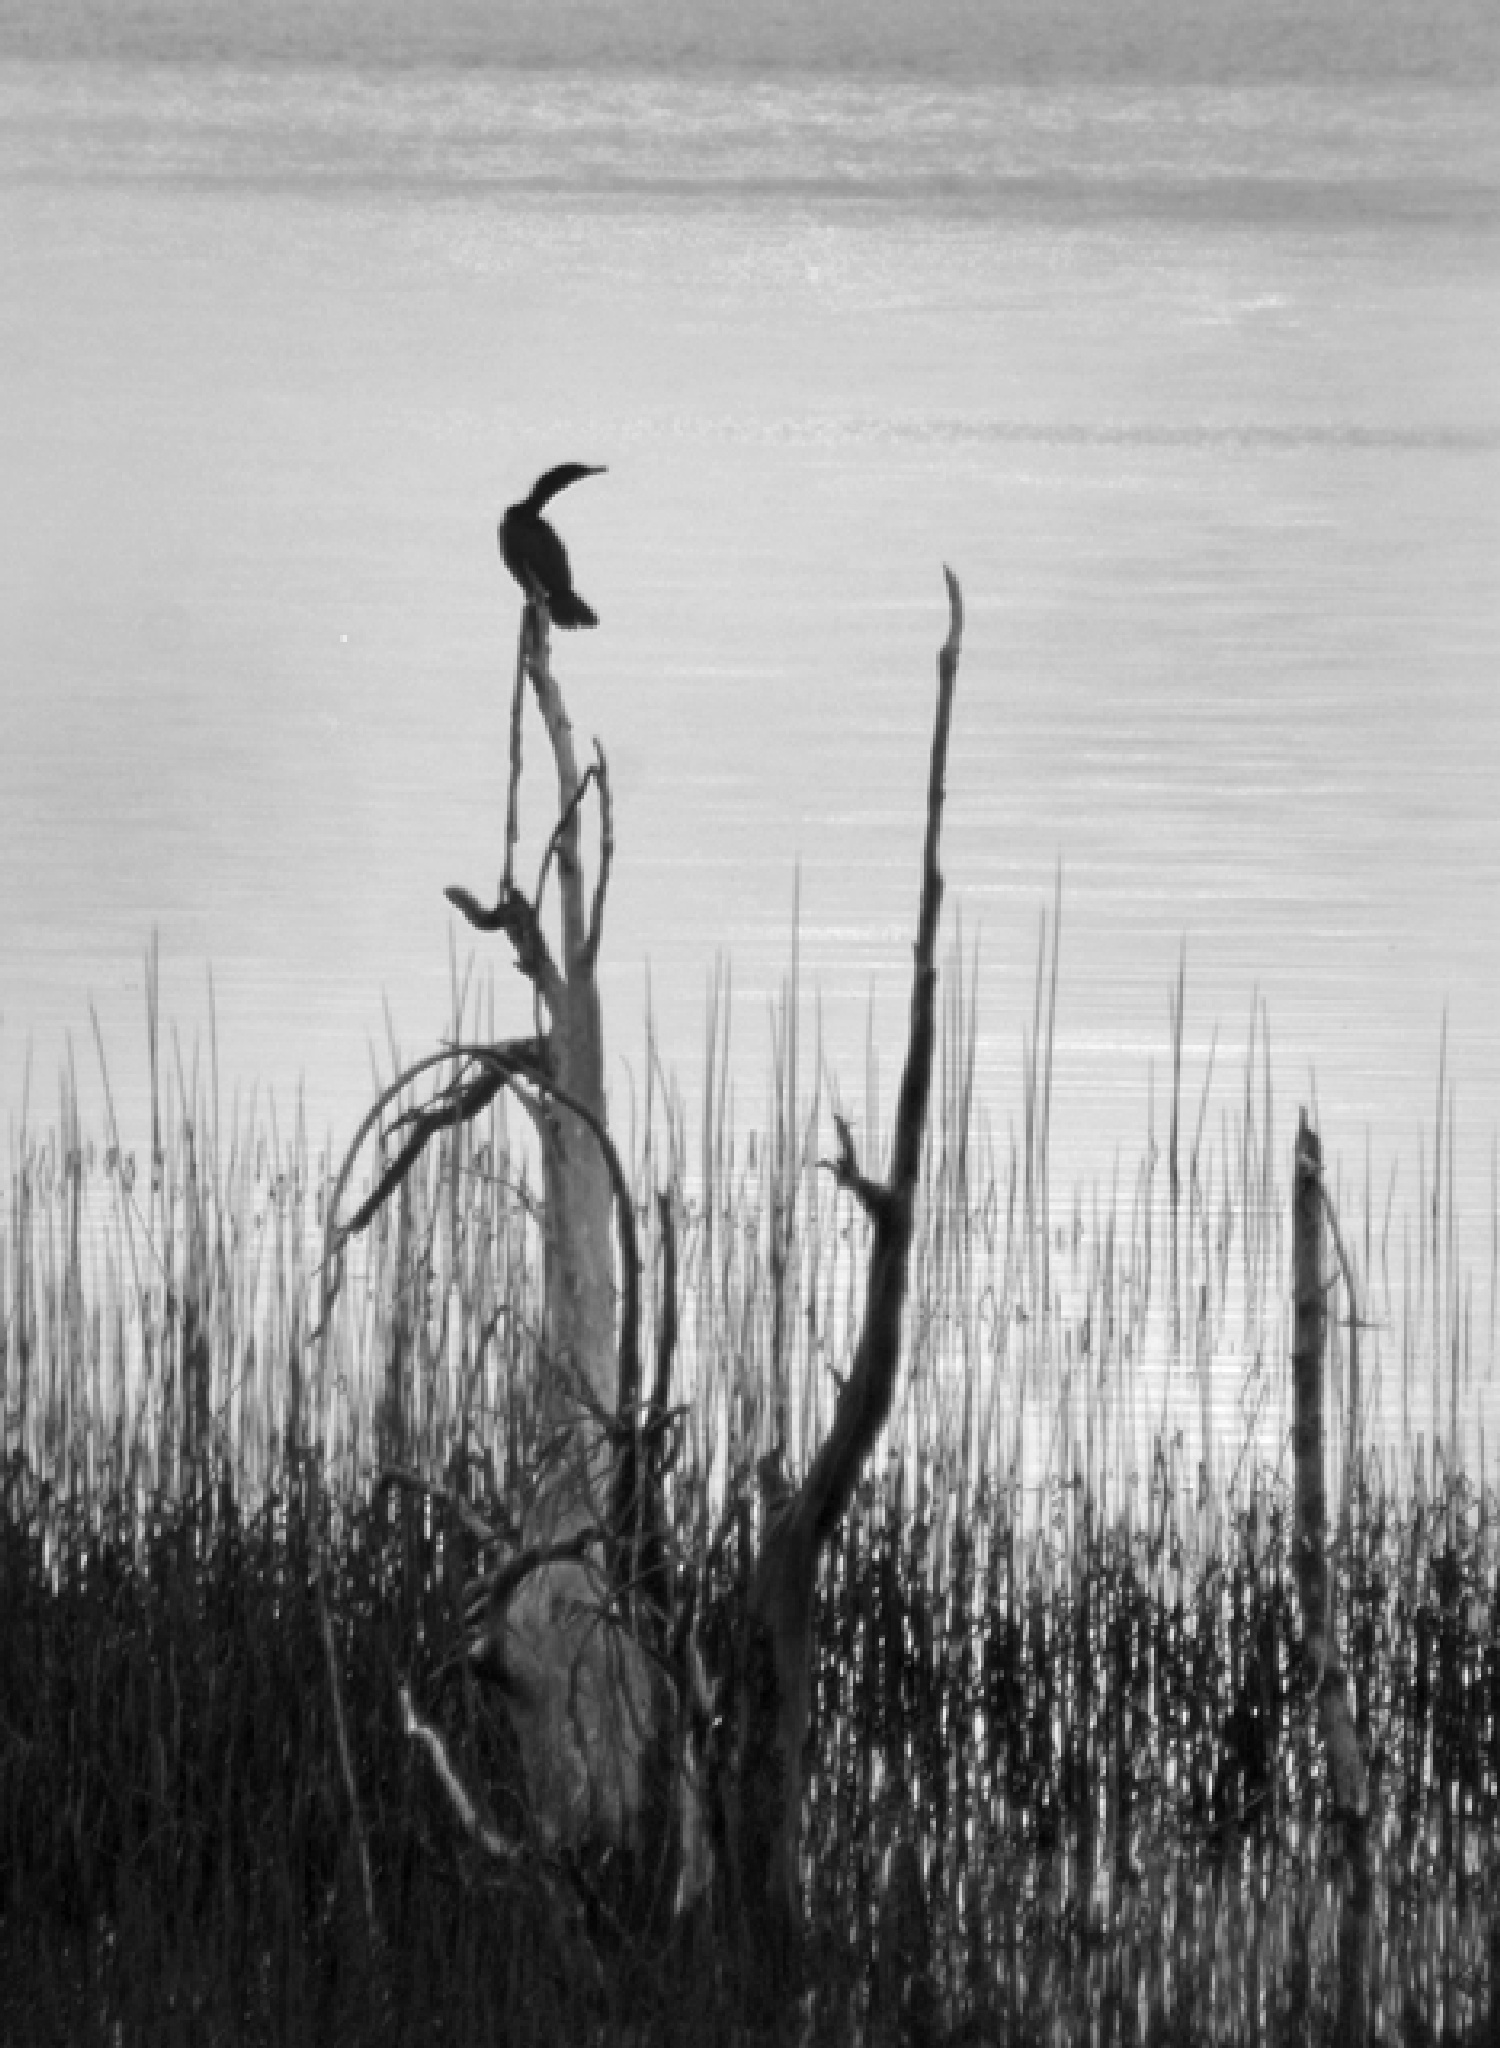 Cormorant on Snag by egcaldwell